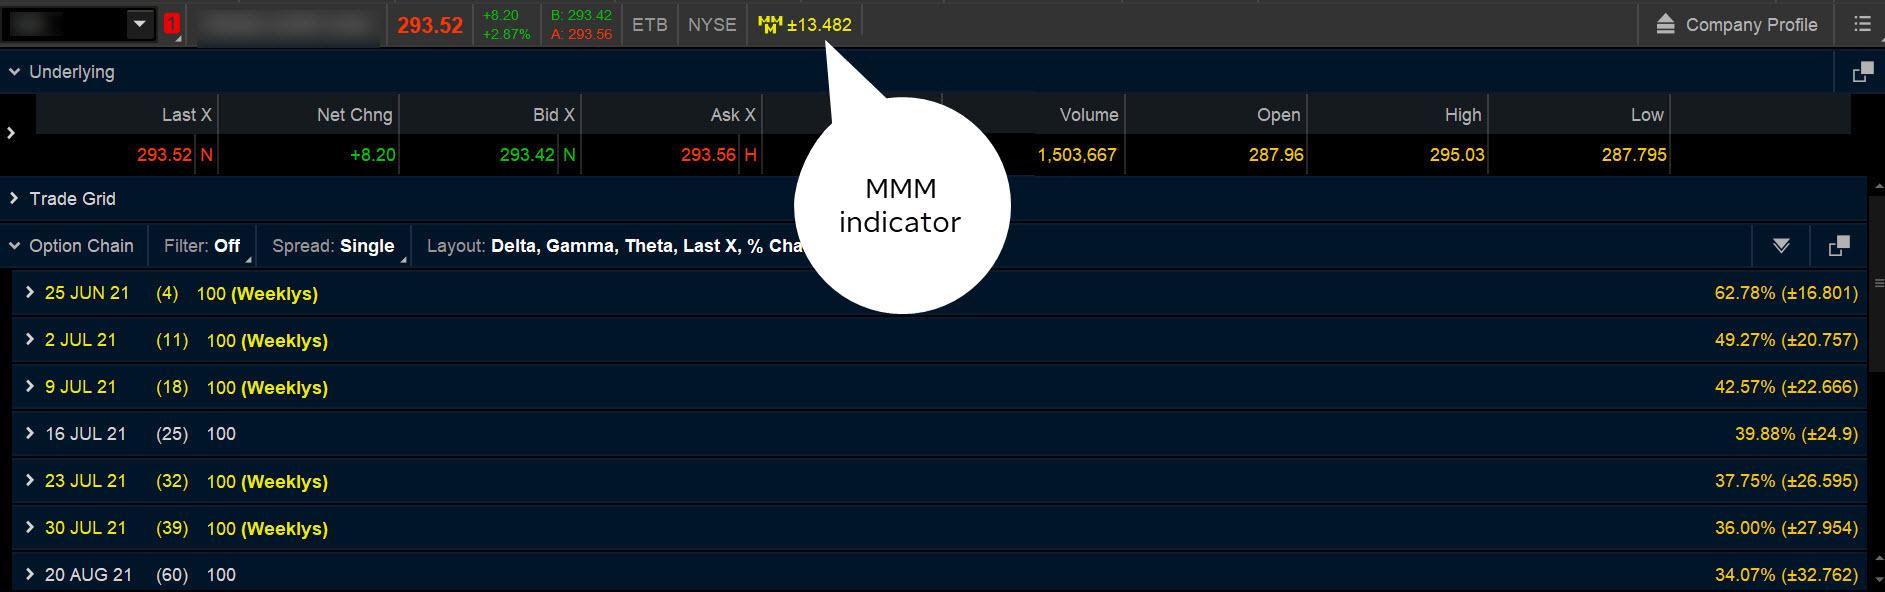 Market maker move indicator on thinkorswim platform